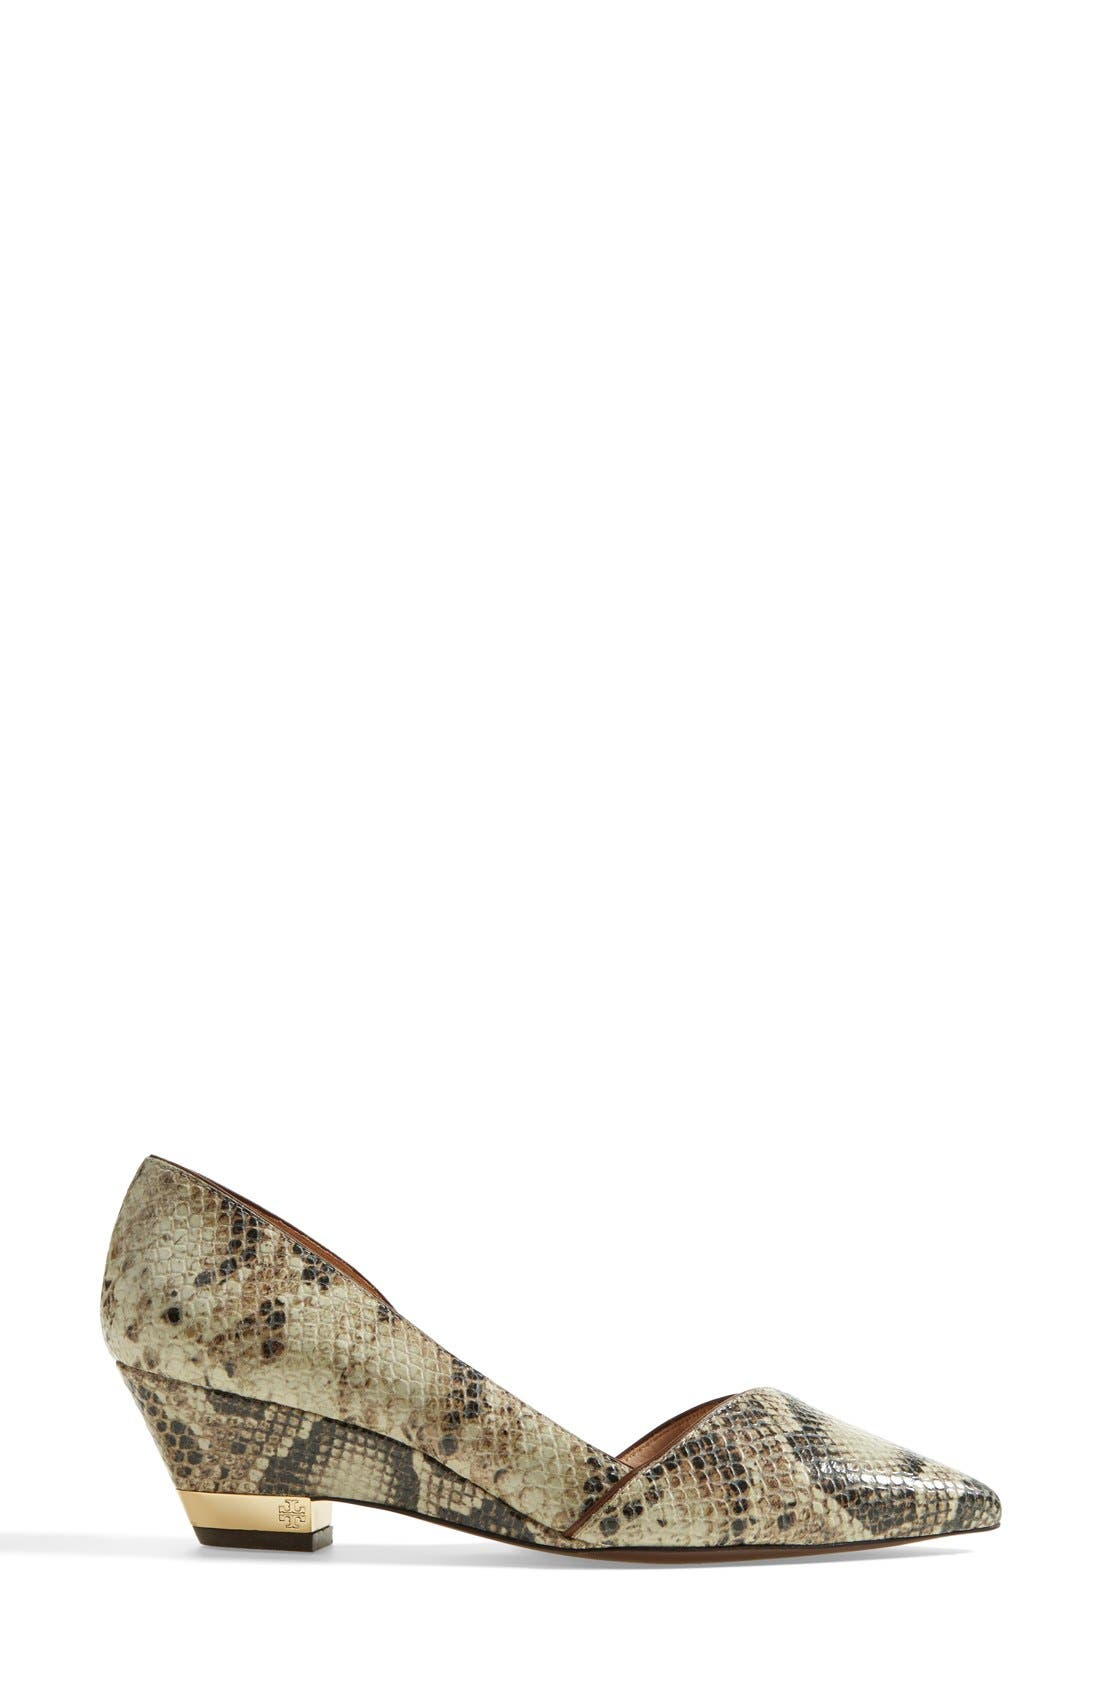 Alternate Image 4  - Tory Burch 'Mila' Snake Embossed Leather Demi Wedge Pump (Women)